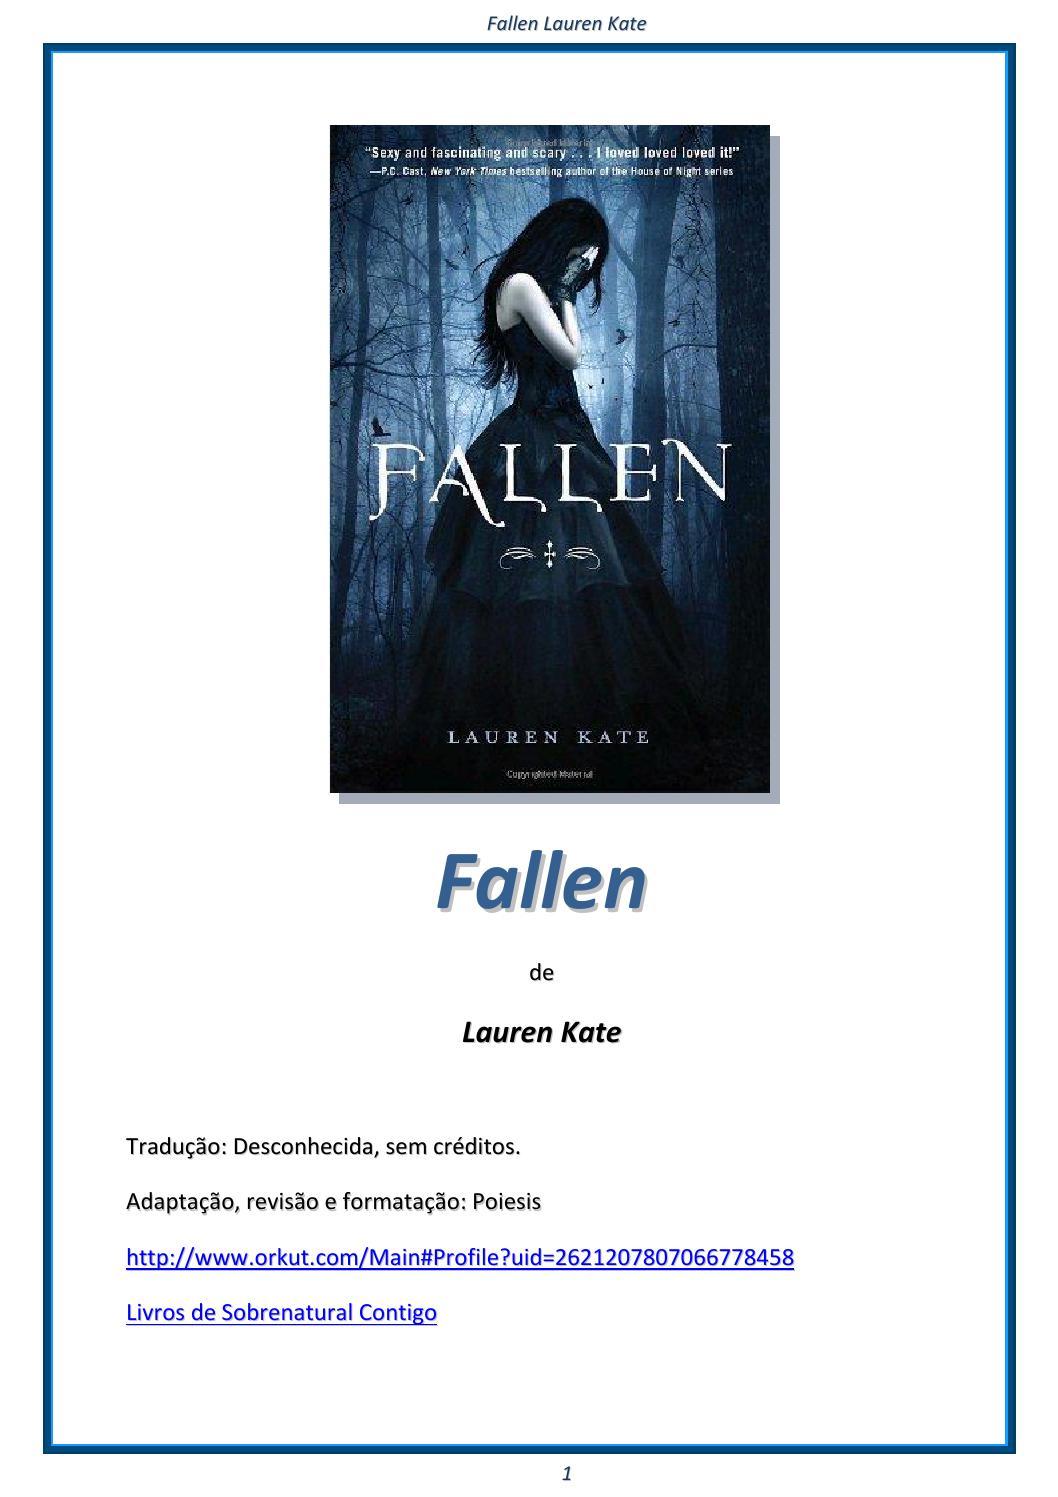 5955b18972c23 Lauren kate série fallen 1 fallen by Gabiiz Pattz - issuu